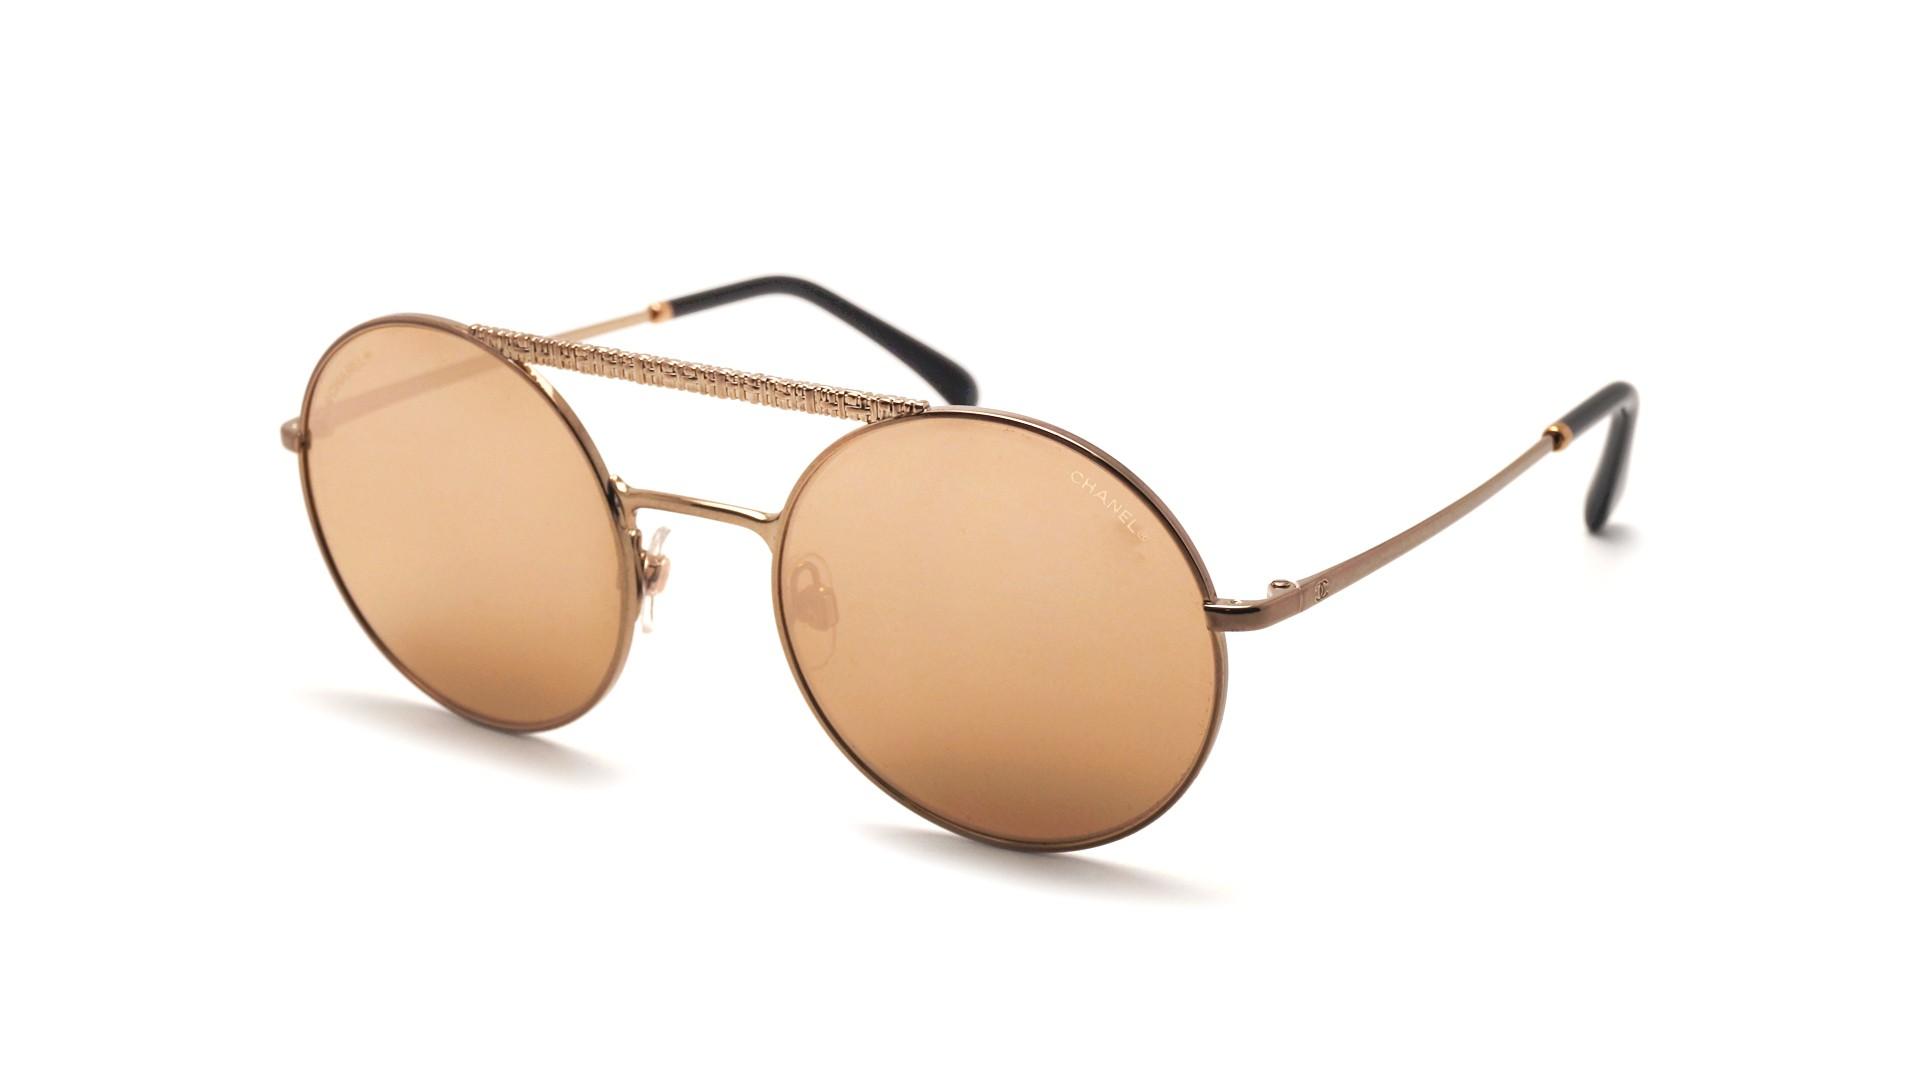 802124ee2c129 Sunglasses Chanel CH4232 C470 T6 53-21 Gold Medium Flash